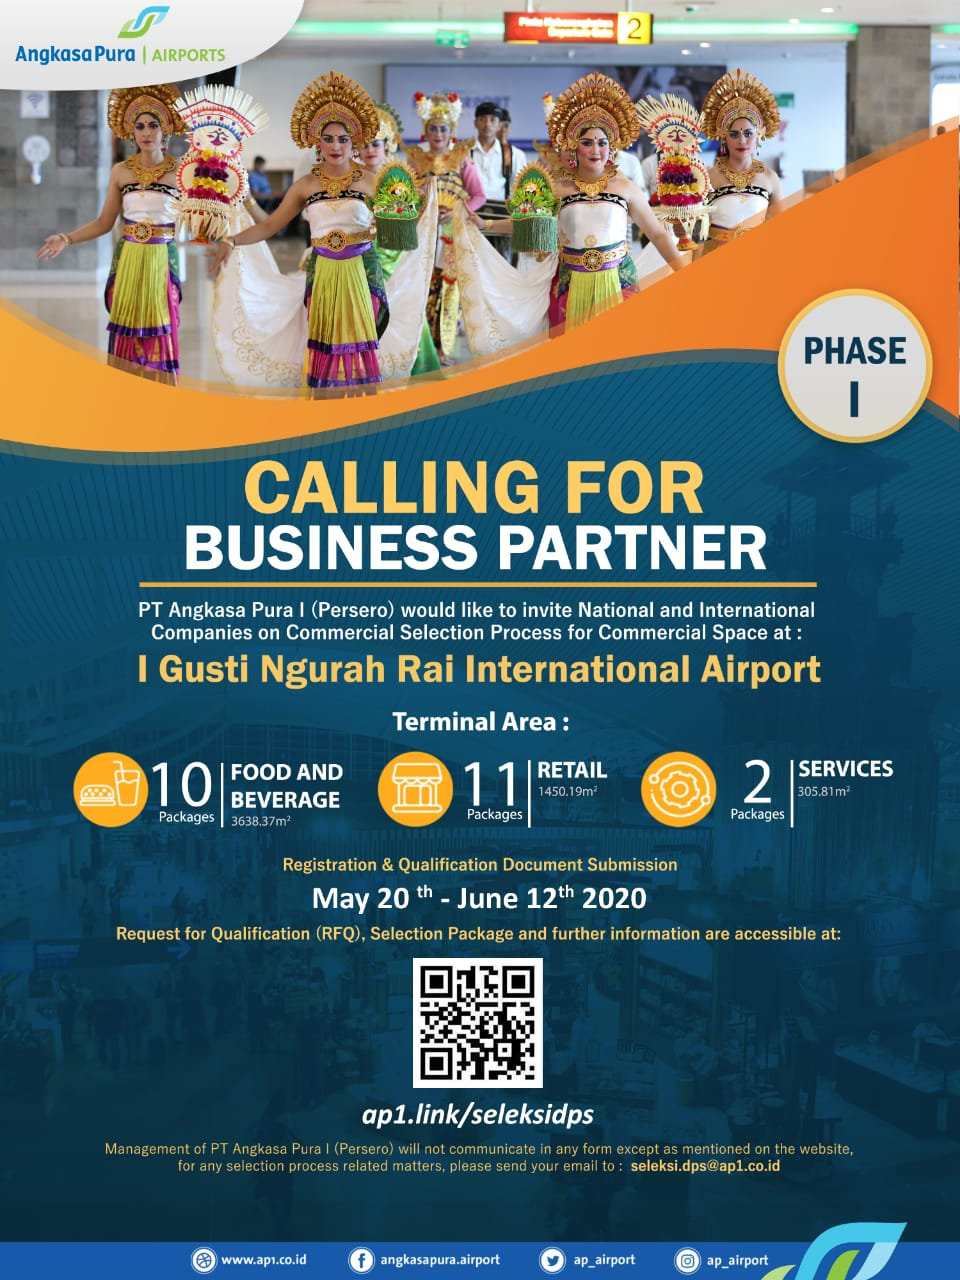 PT Angkasa Pura I (Persero) Kantor Cabang Bandara I Gusti Ngurah Rai Bali membuka seleksi mitra usaha (commercial business partner) dalam rangka menyambut kebangkitan industri pariwisata pada 2021 mendatang.